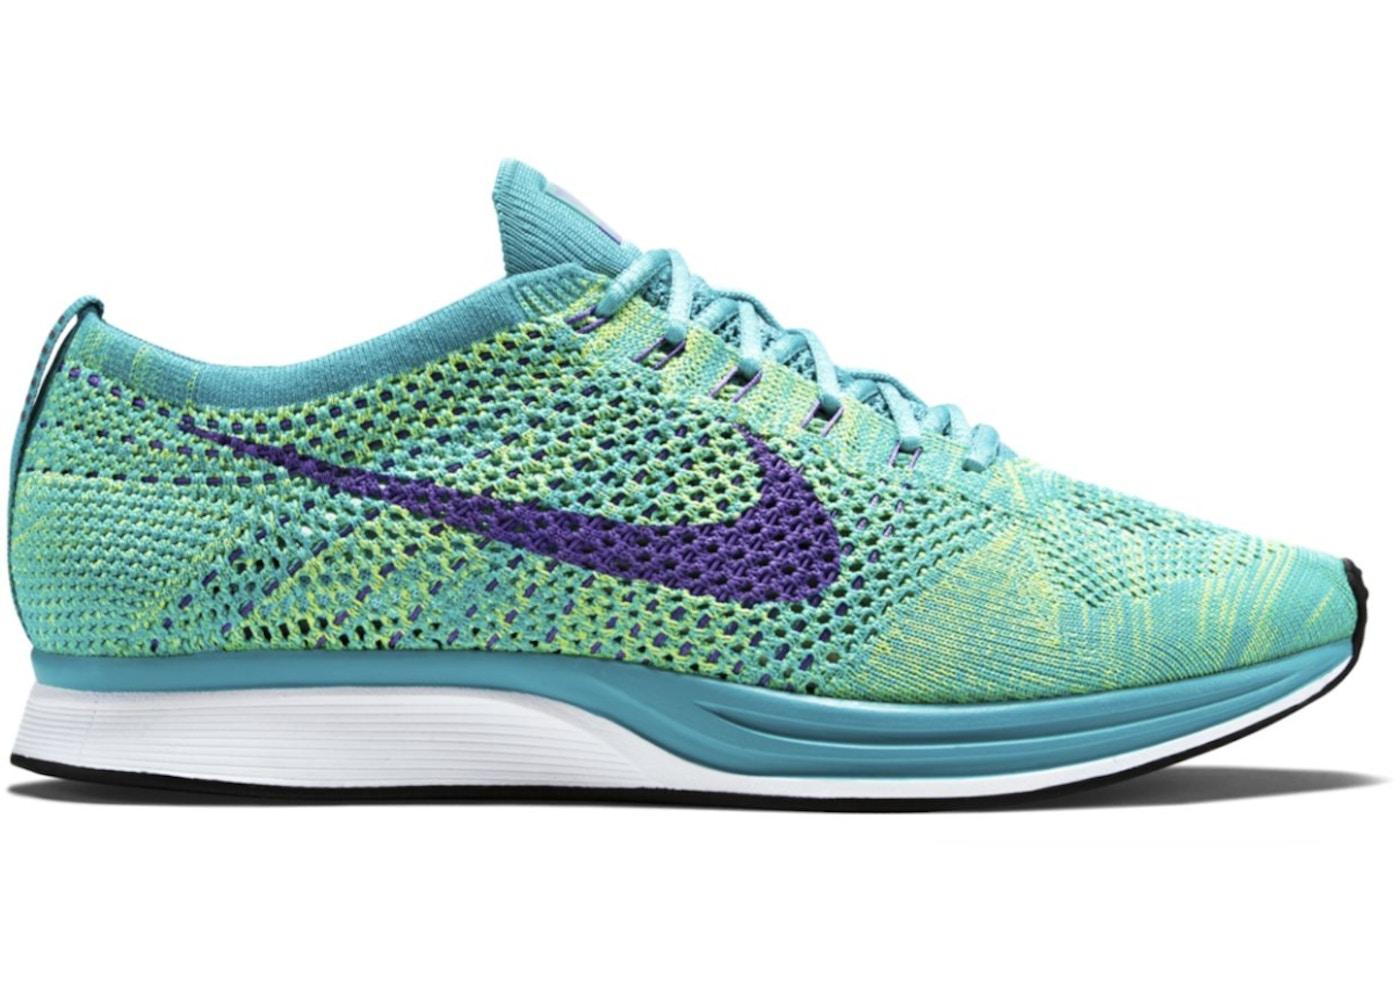 separation shoes 83e2a bdbe1 Nike Flyknit Racer Sport Turquoise Hyper Grape